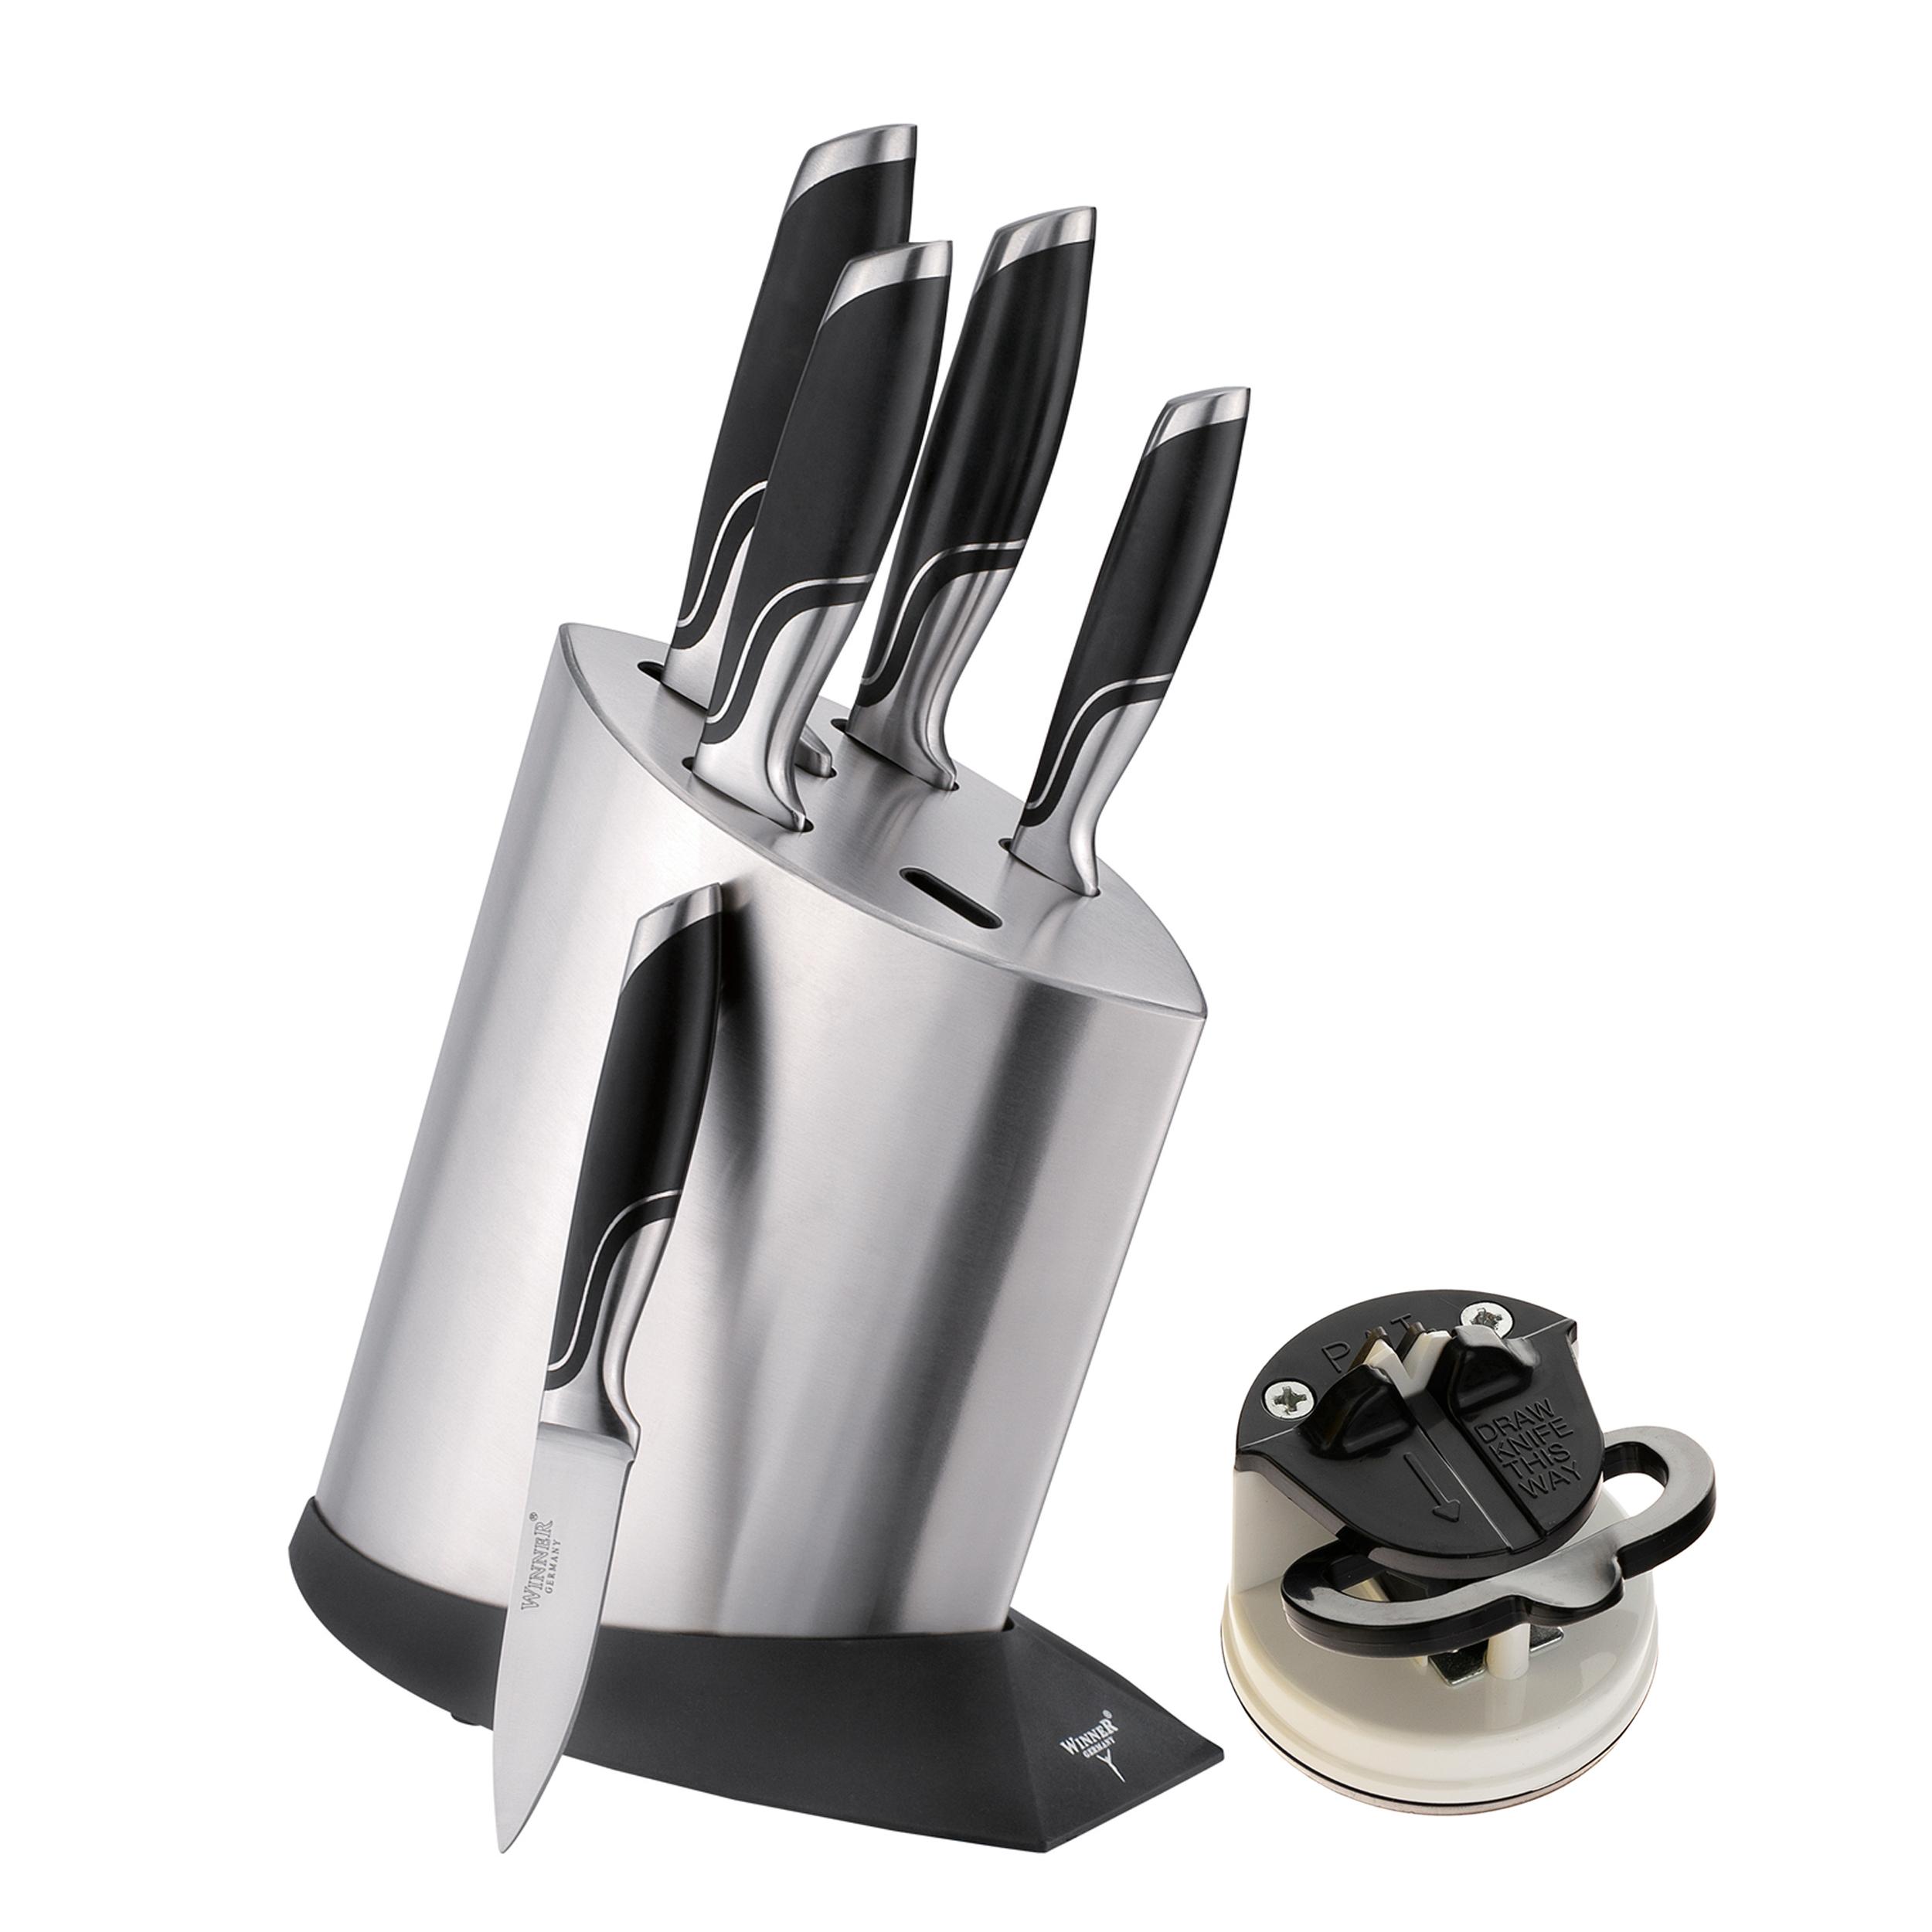 سرویس چاقو آشپزخانه 7 پارچه وینر کد W7336S به همراه چاقو تیزکن